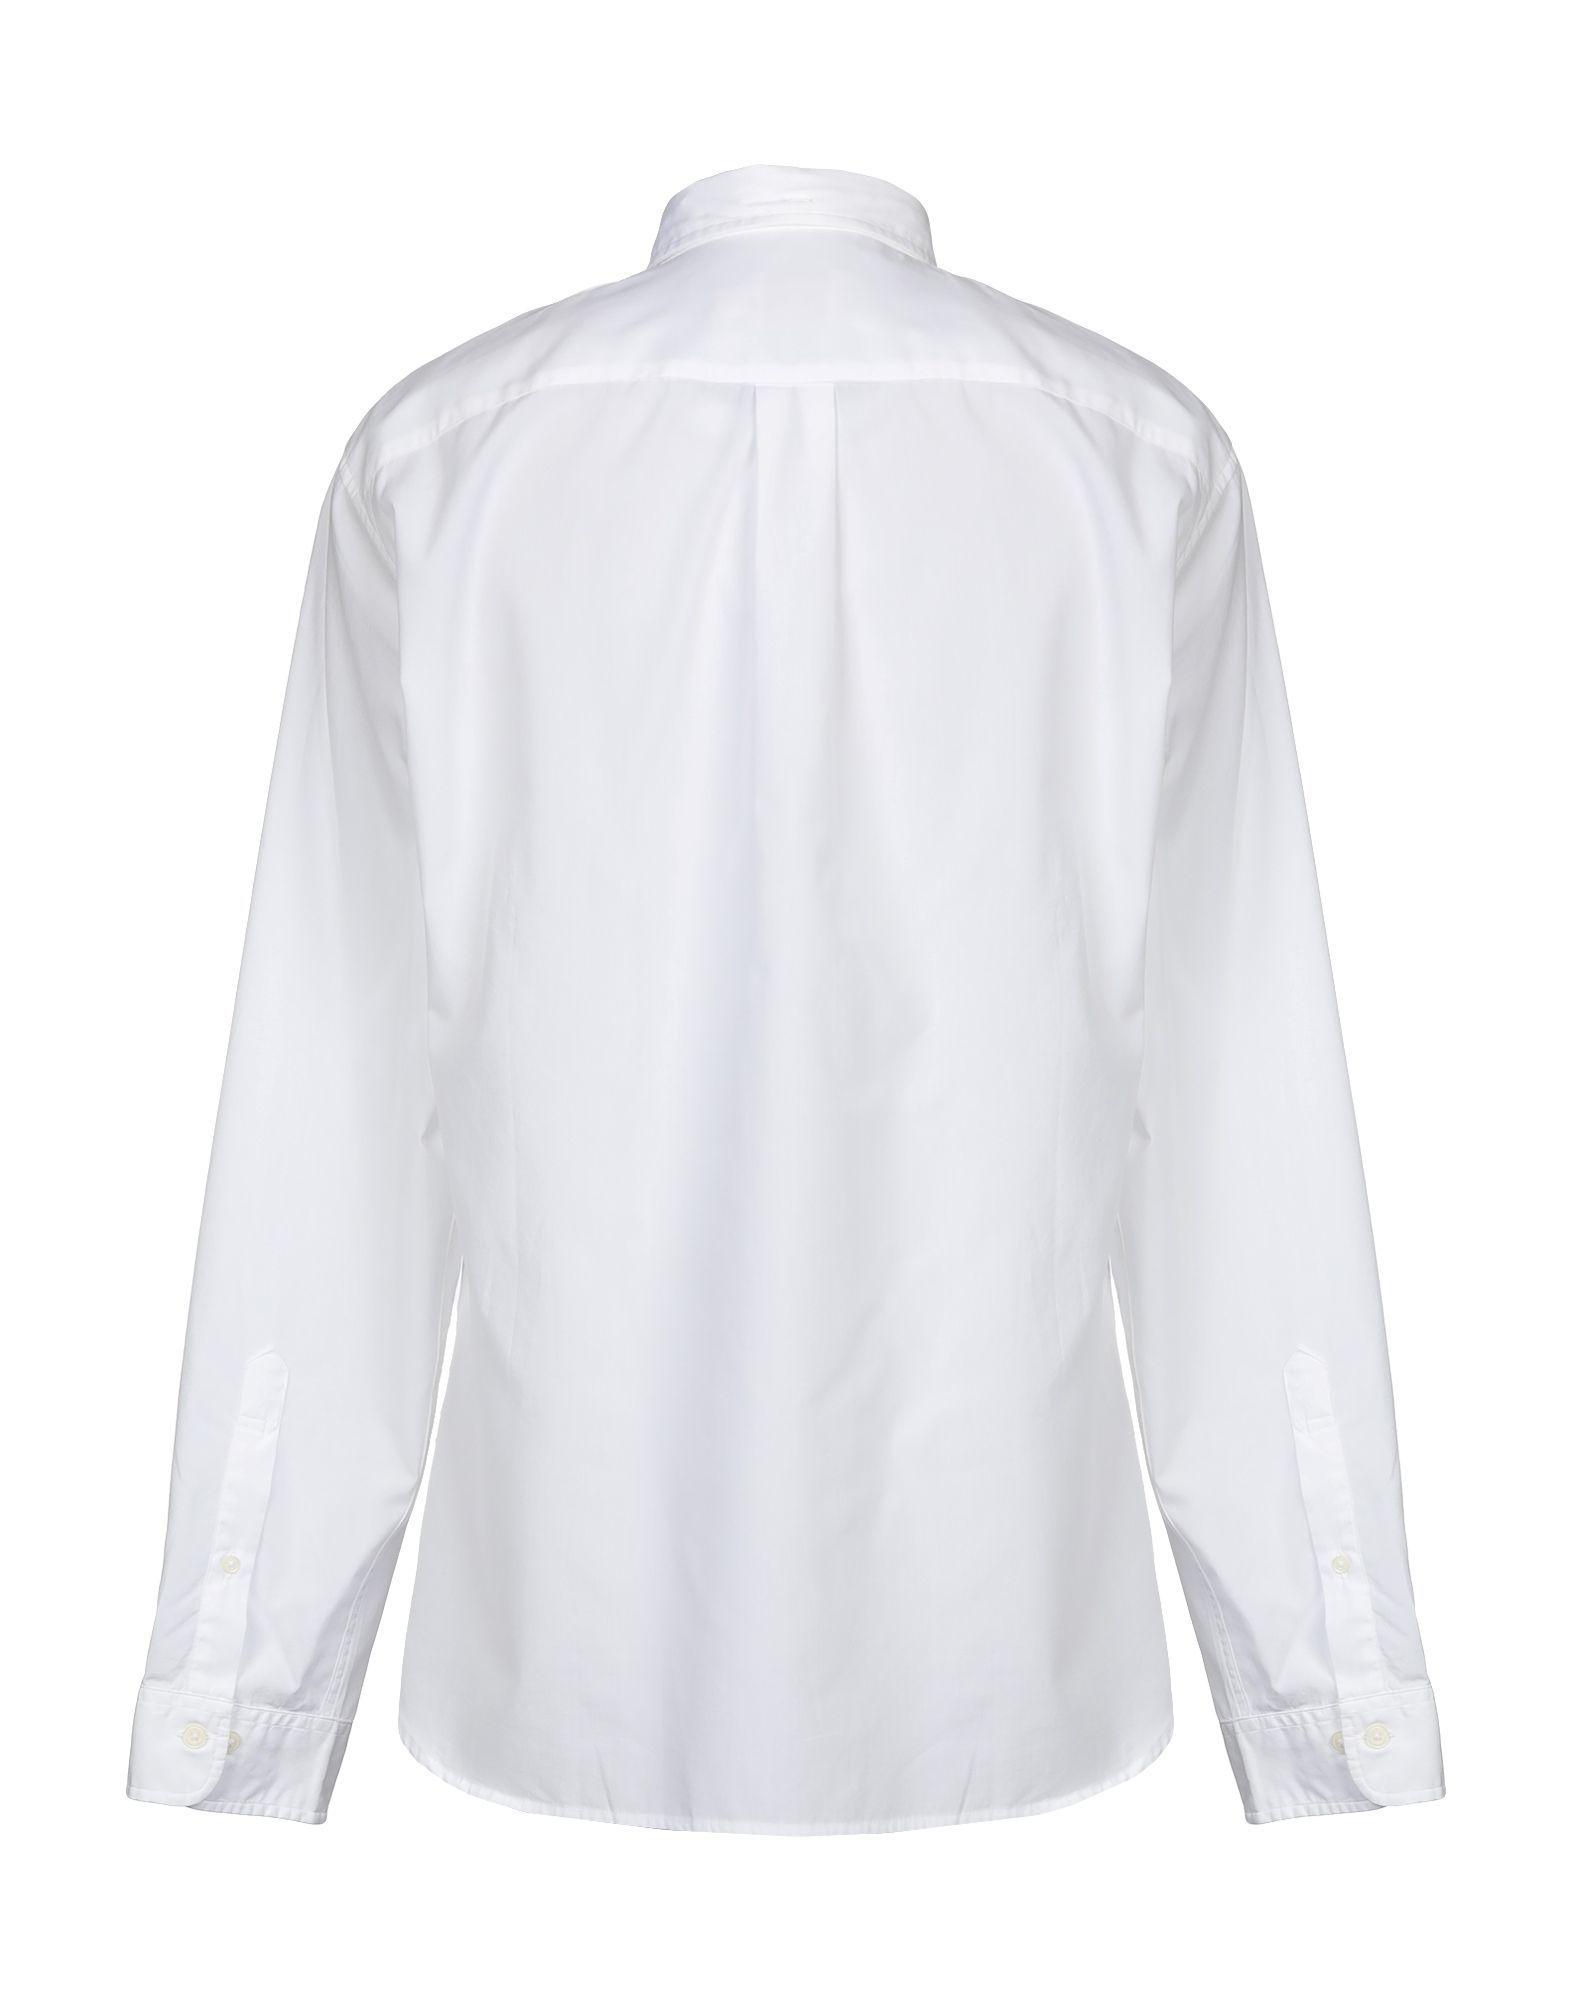 Brooks Brothers White Cotton Shirt